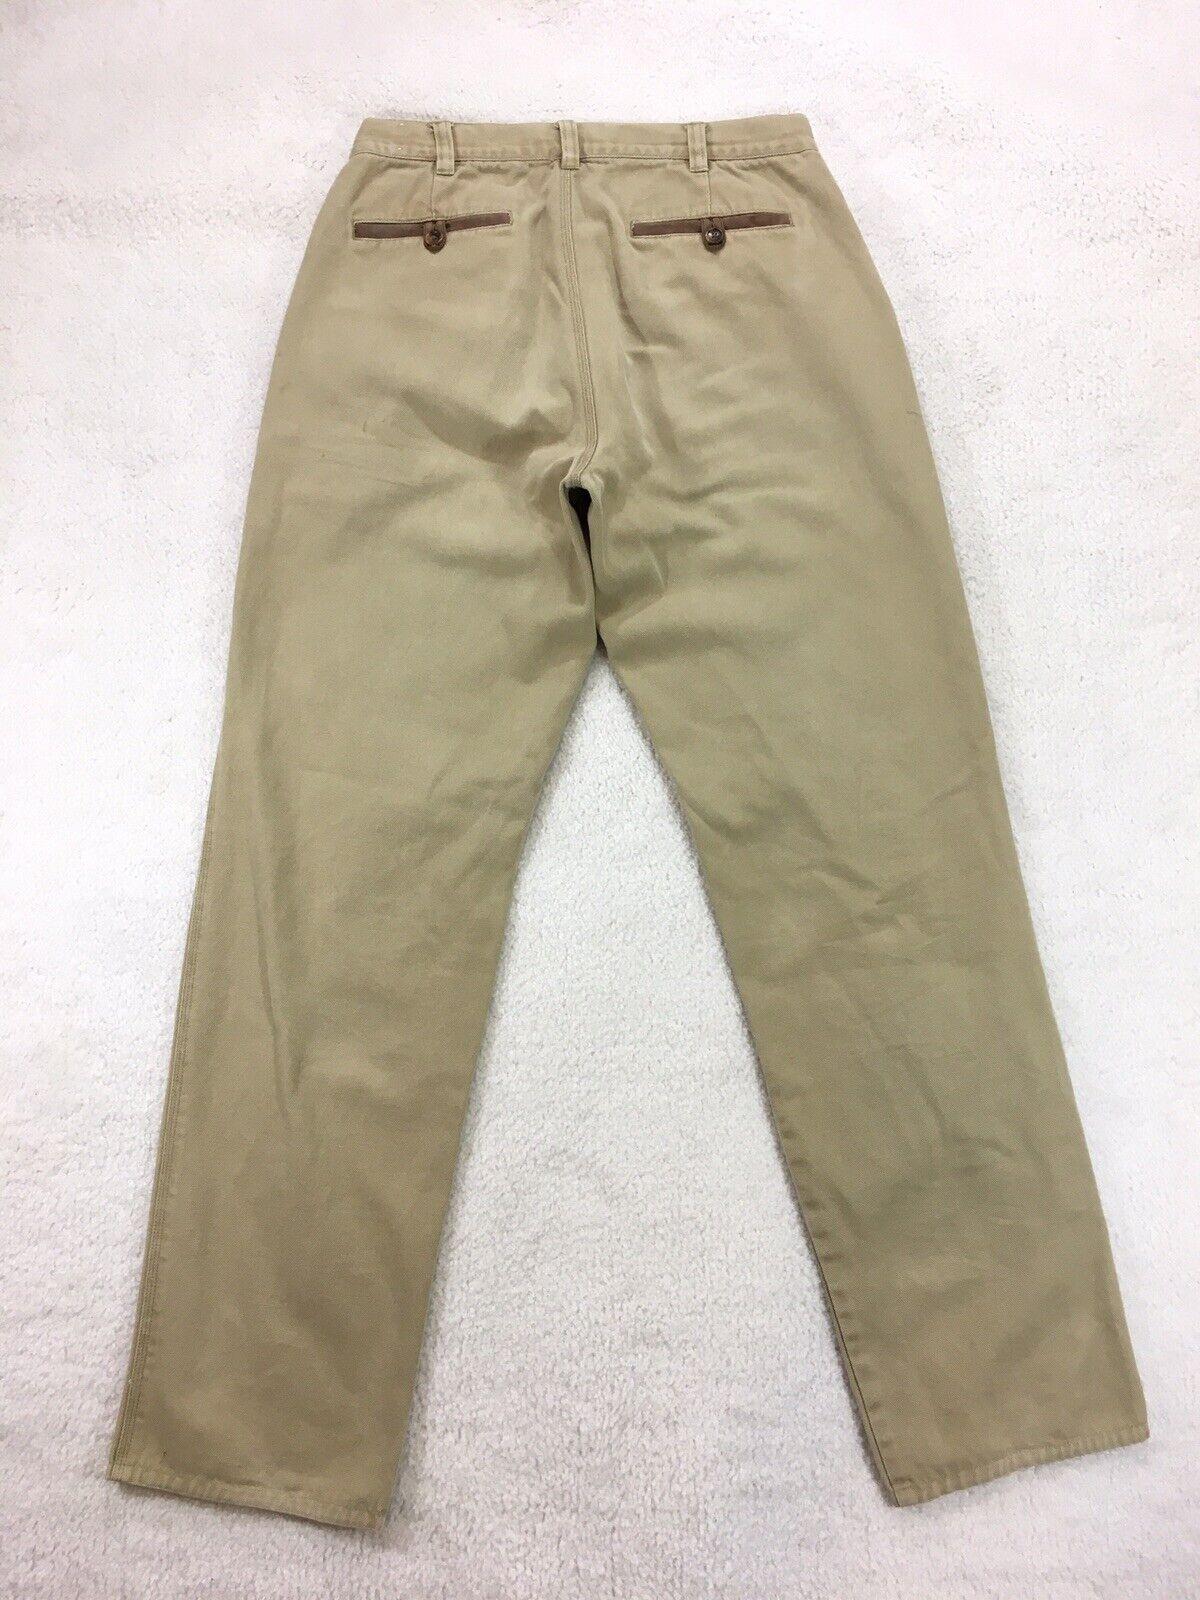 ORVIS Khaki Tan Canvas Cotton Heavy Duty Outdoor Work Pants Men's 32x33